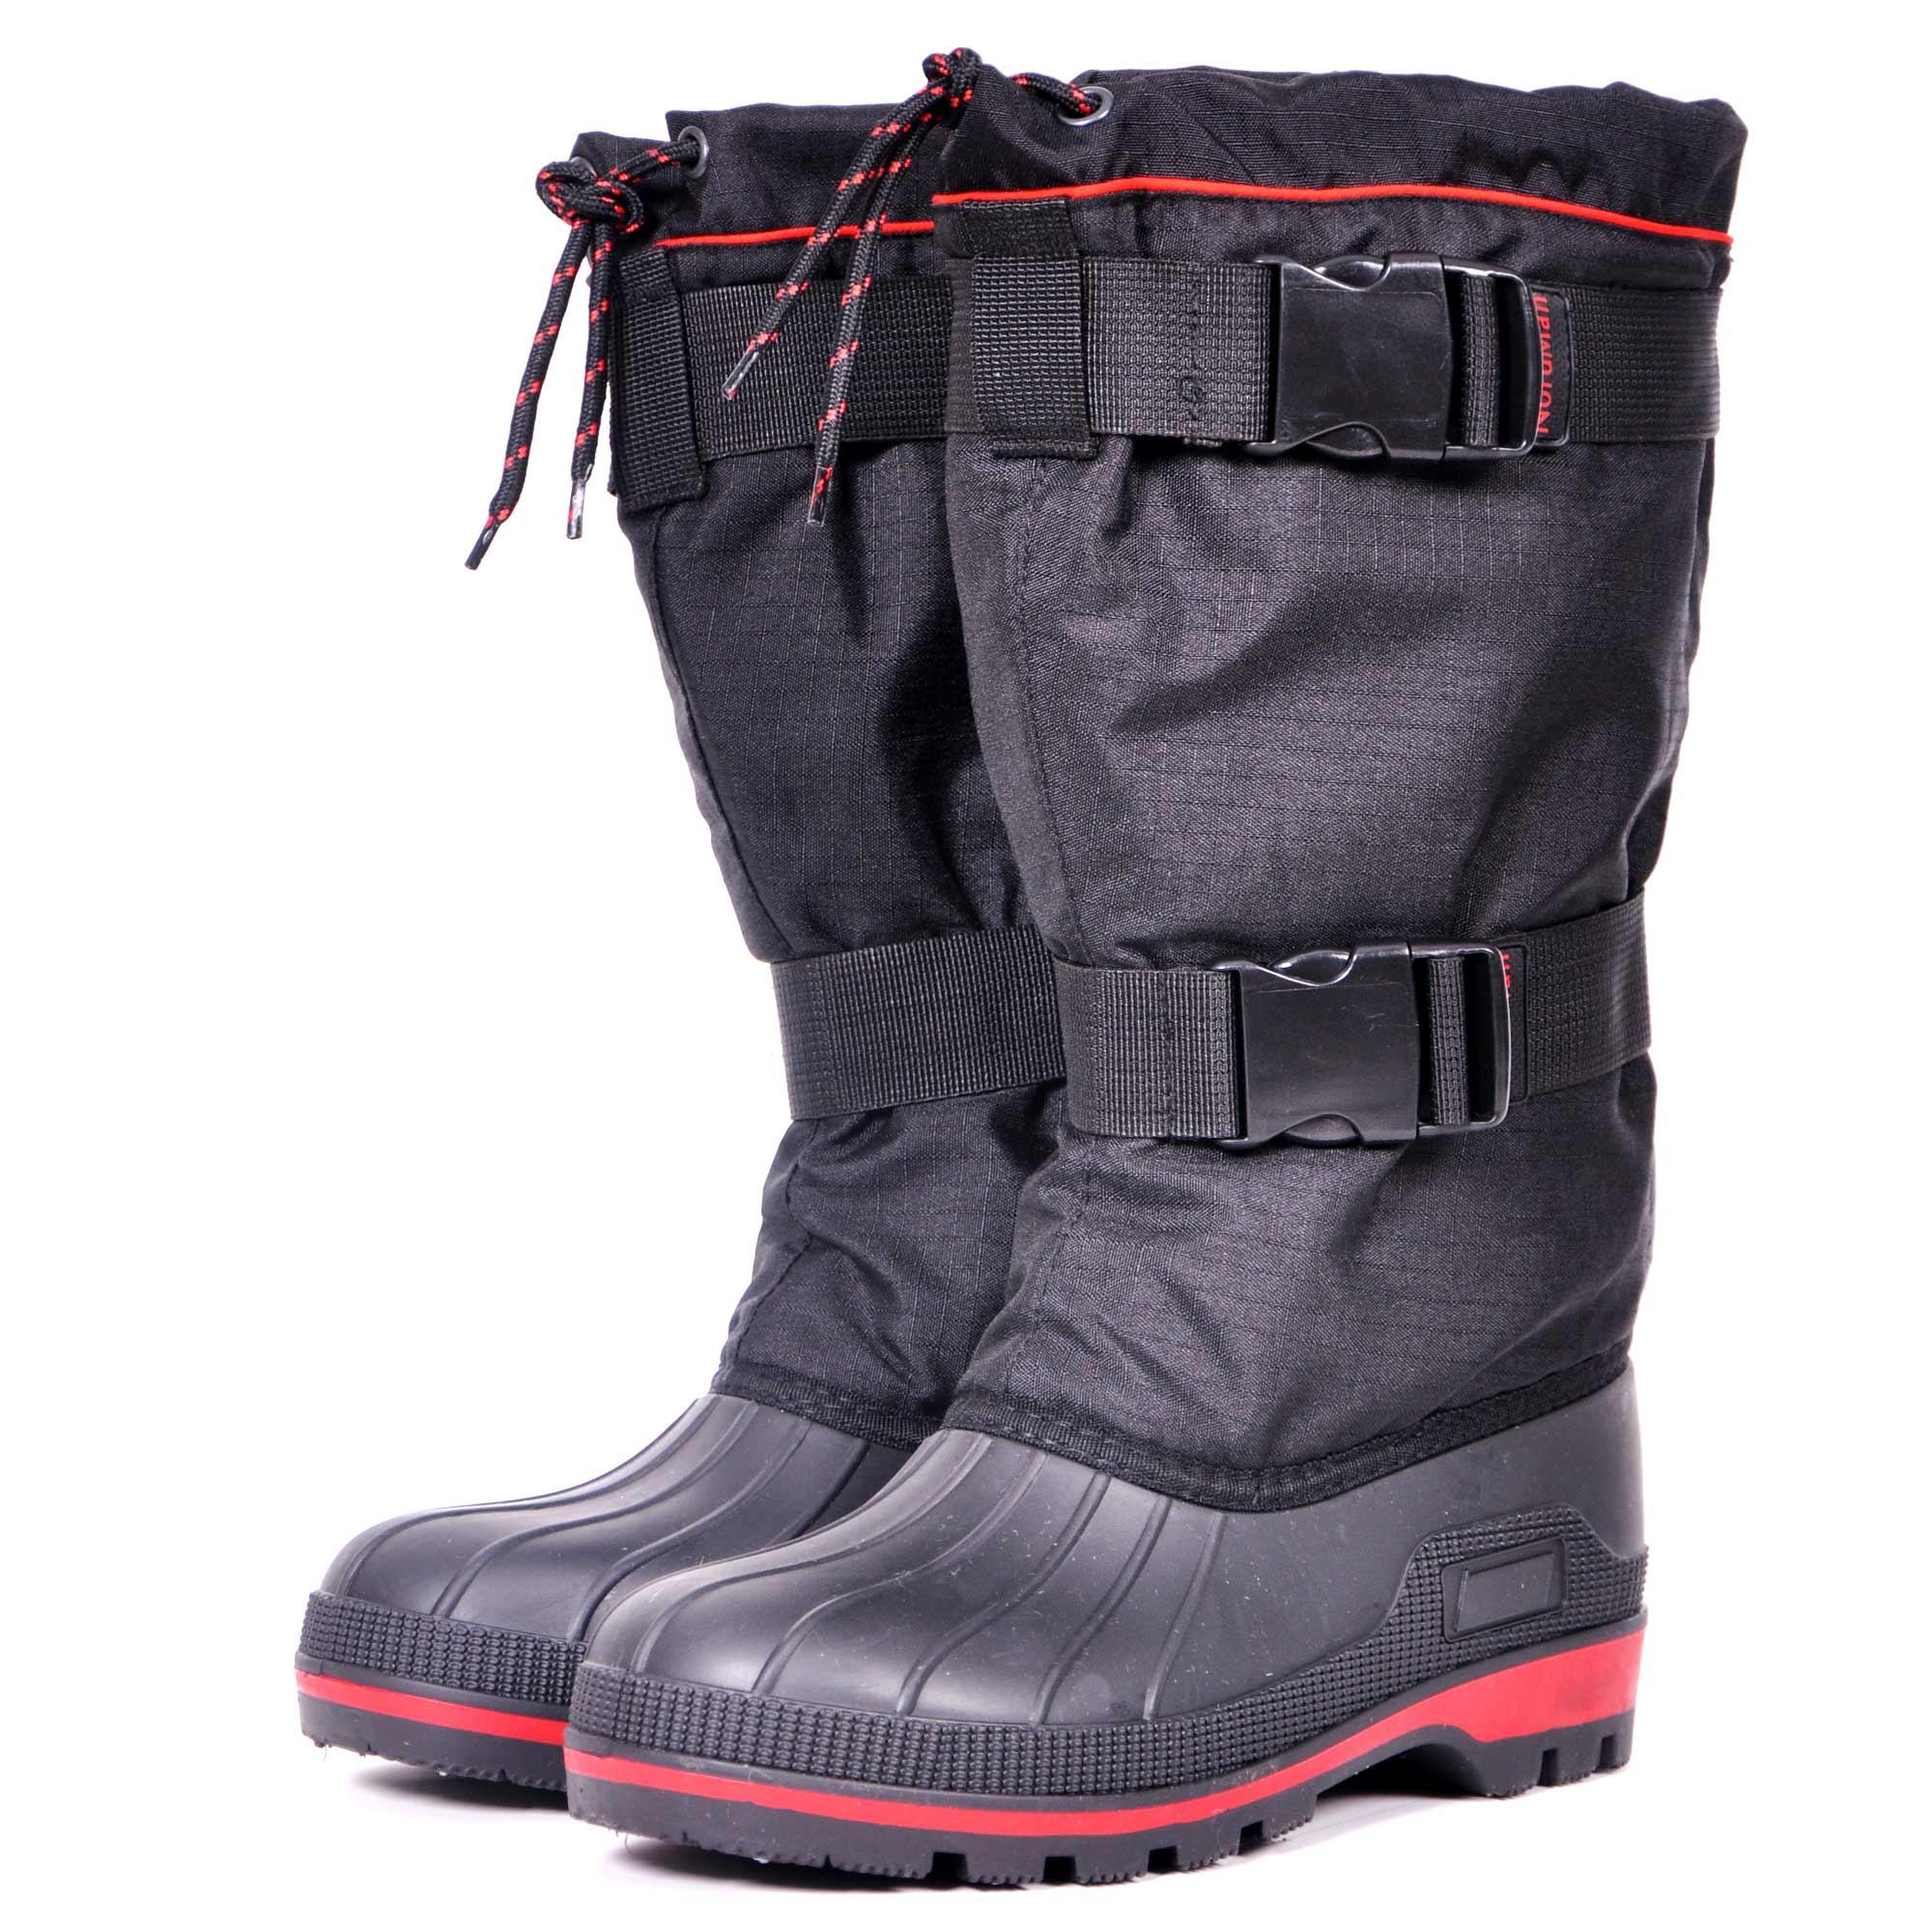 Бахилы для охоты Nordman New Red, на карабинах, черные, 46 RU